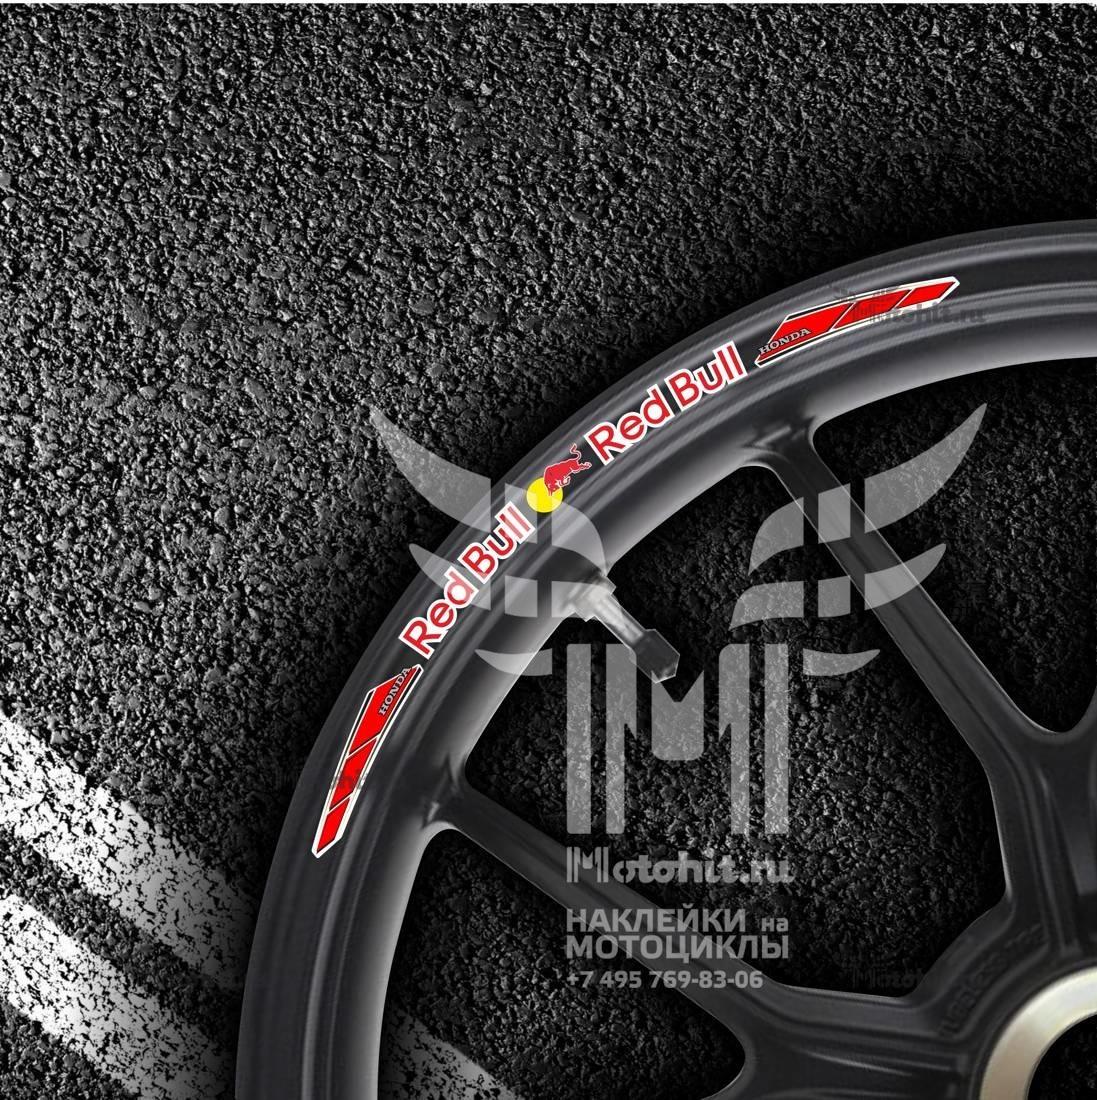 Комплект наклеек на обод колеса мотоцикла HONDA RED-BULL